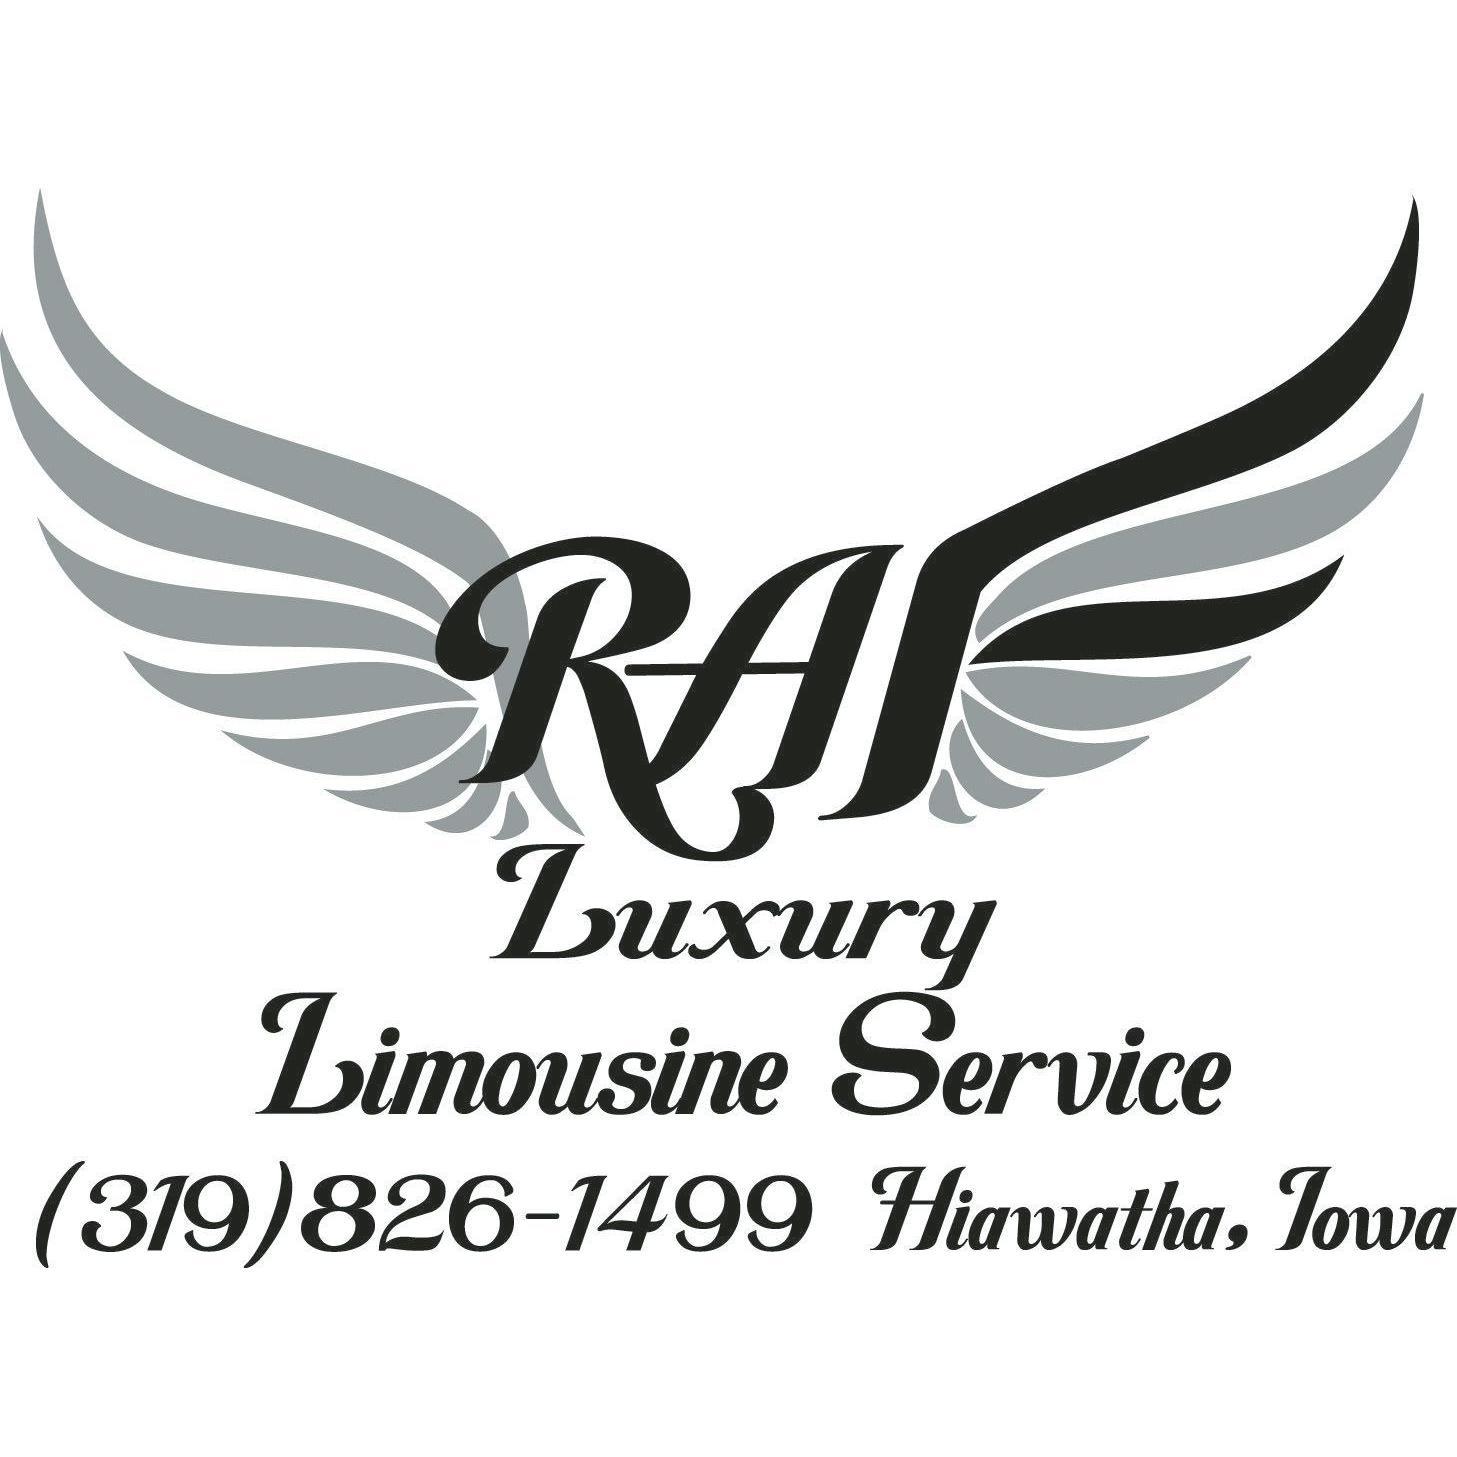 RAF Luxury Limo Service image 3